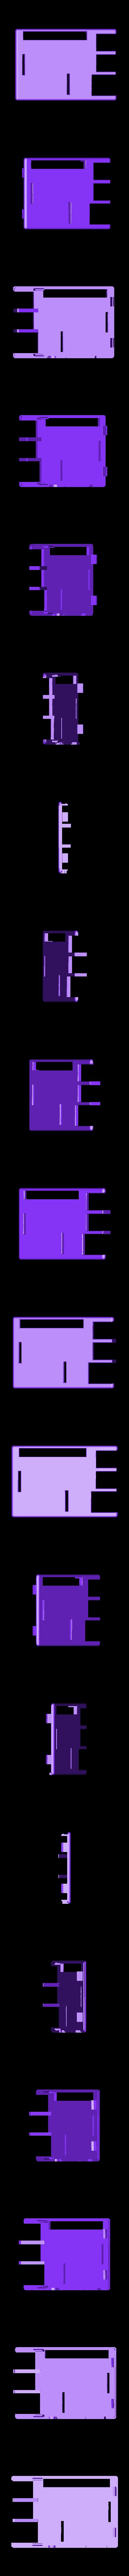 Pi_Snug_Case_Top.stl Download free STL file Raspberry Pi Snug Case • 3D printable design, Aralala